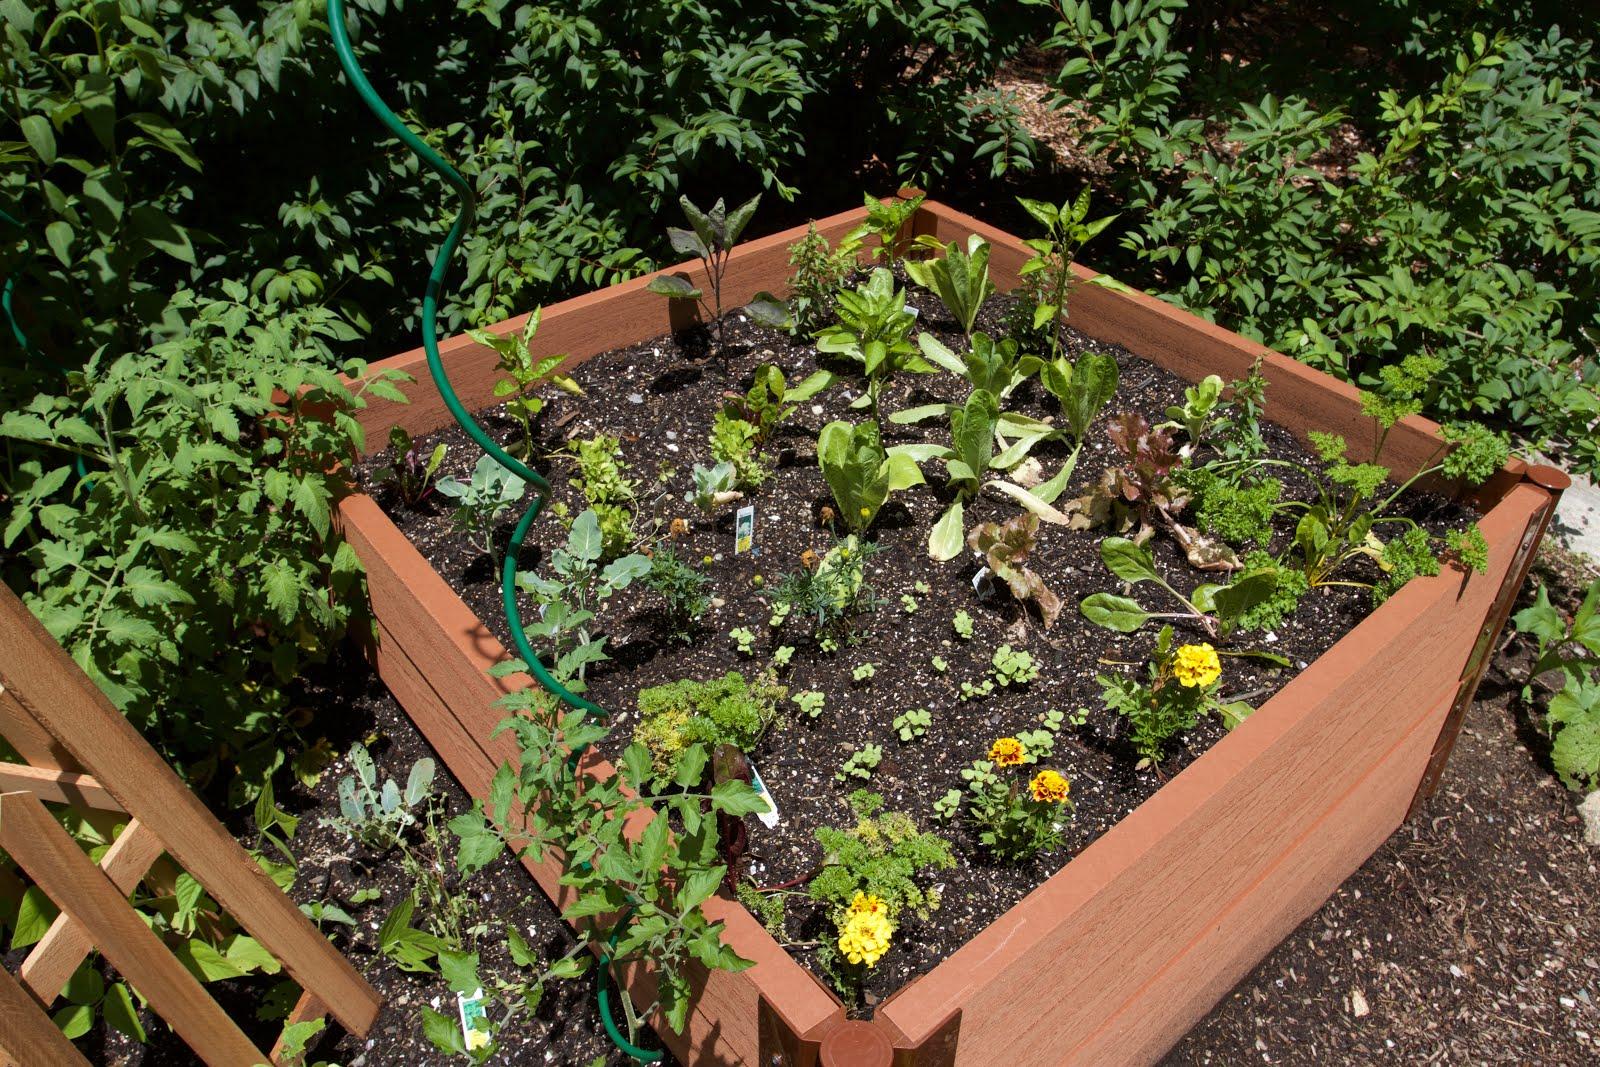 Freshly planted